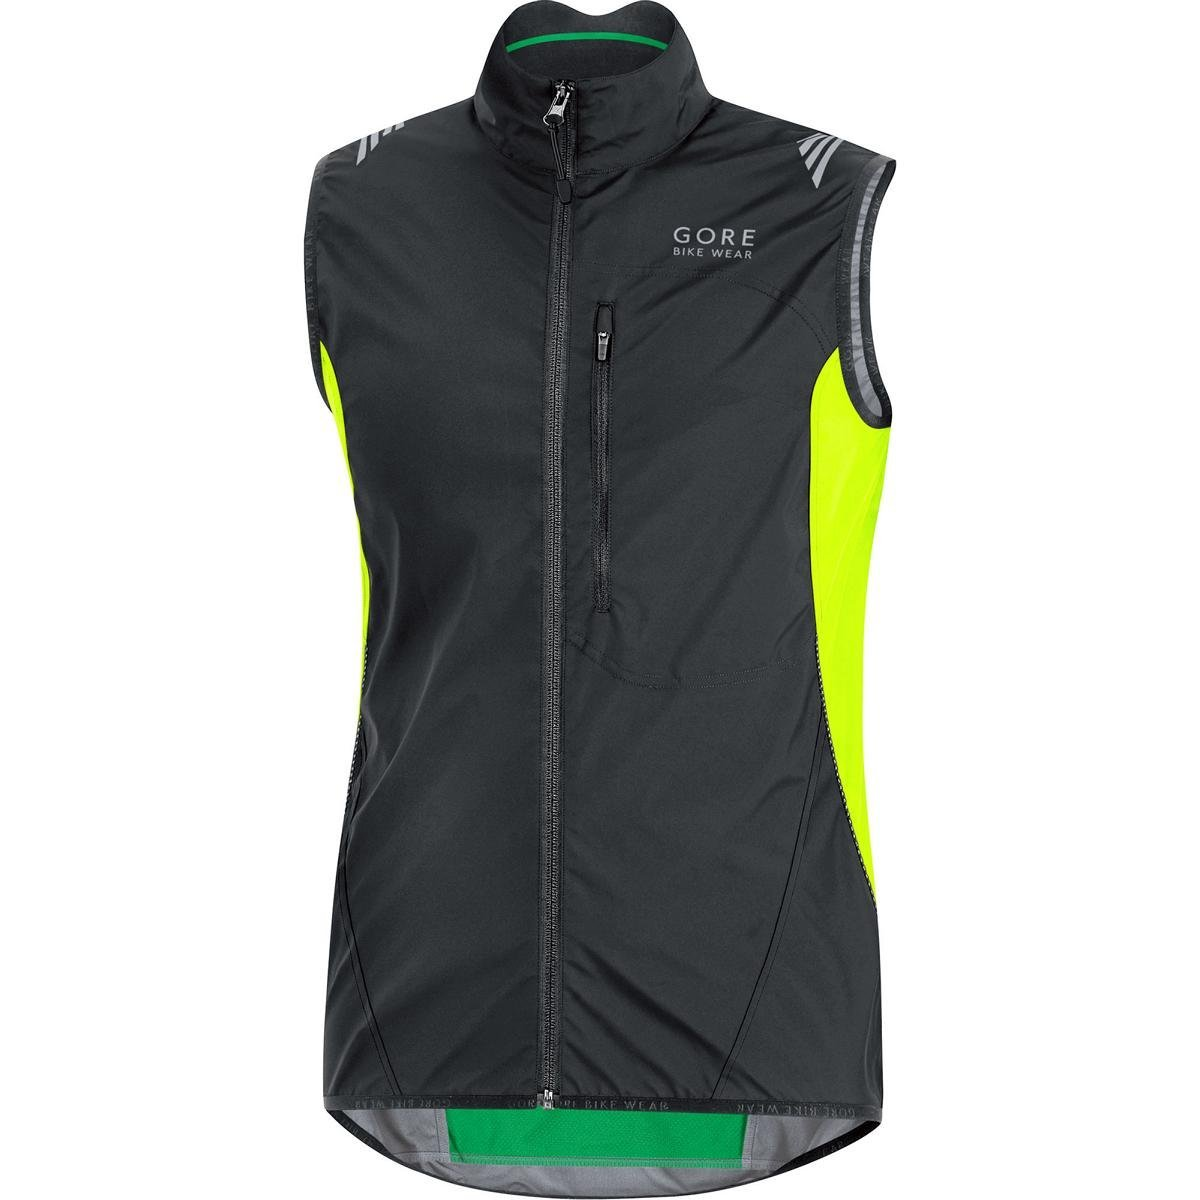 GORE BIKE WEAR Men's Cycling Vest, Super-Light, Compact, GORE WINDSTOPPER, ELEMENT WS AS Vest, Size S, Black/Neon Yellow, VWLELE